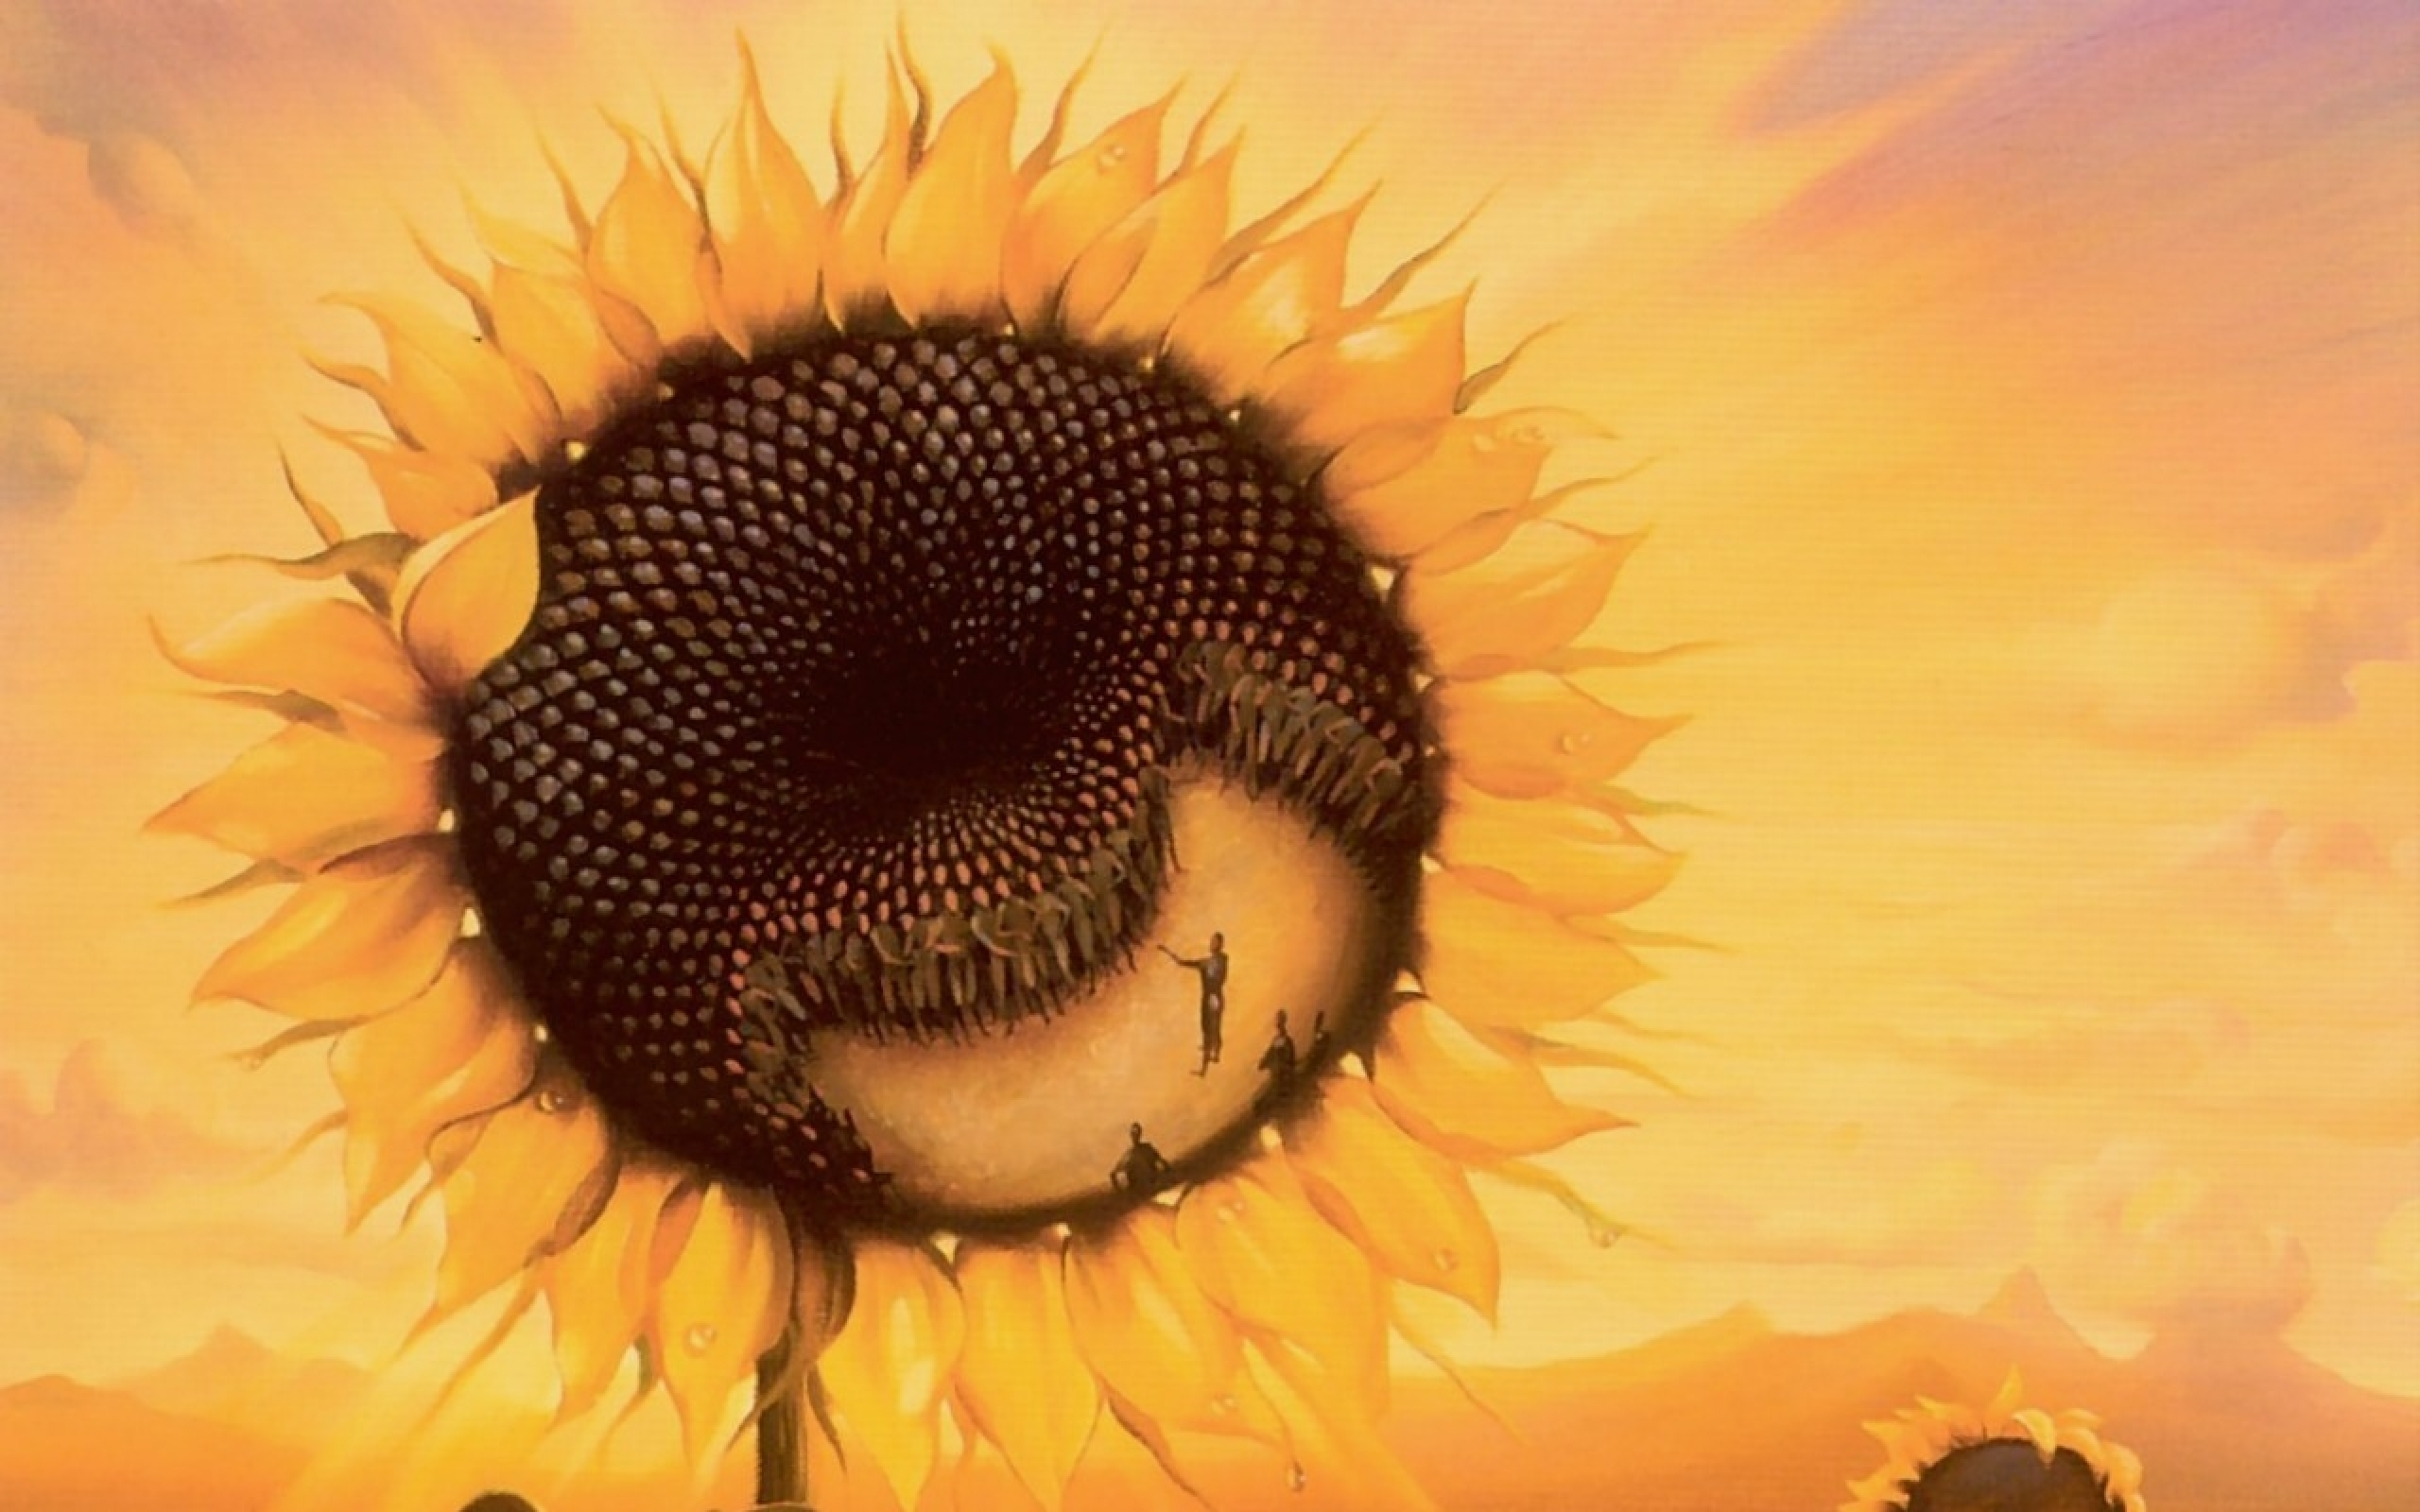 sunflowers vladimir kush 1280x1010 wallpaper Art HD Wallpaper download 2560x1600